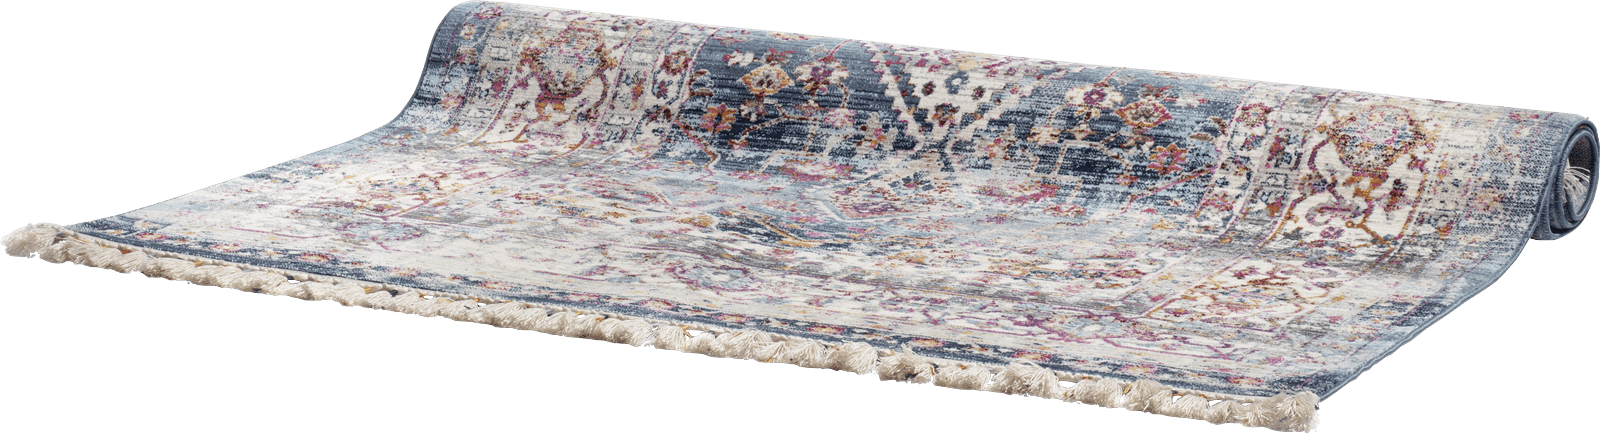 Happy@Home - Coco Maison - brindisi karpet 200x290cm